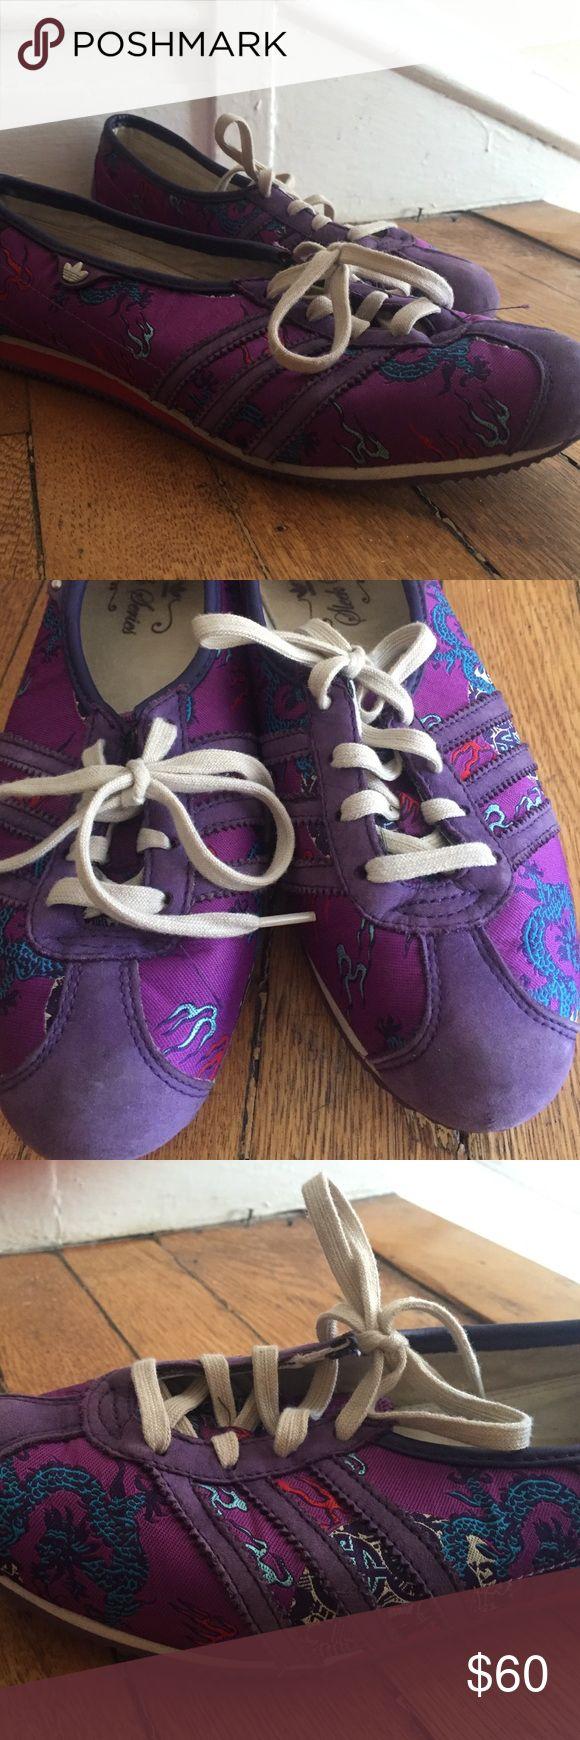 Adidas sleek series year of the dragon tennies Super rad purple year of the dragon Adidas low cut tennies Adidas Shoes Sneakers